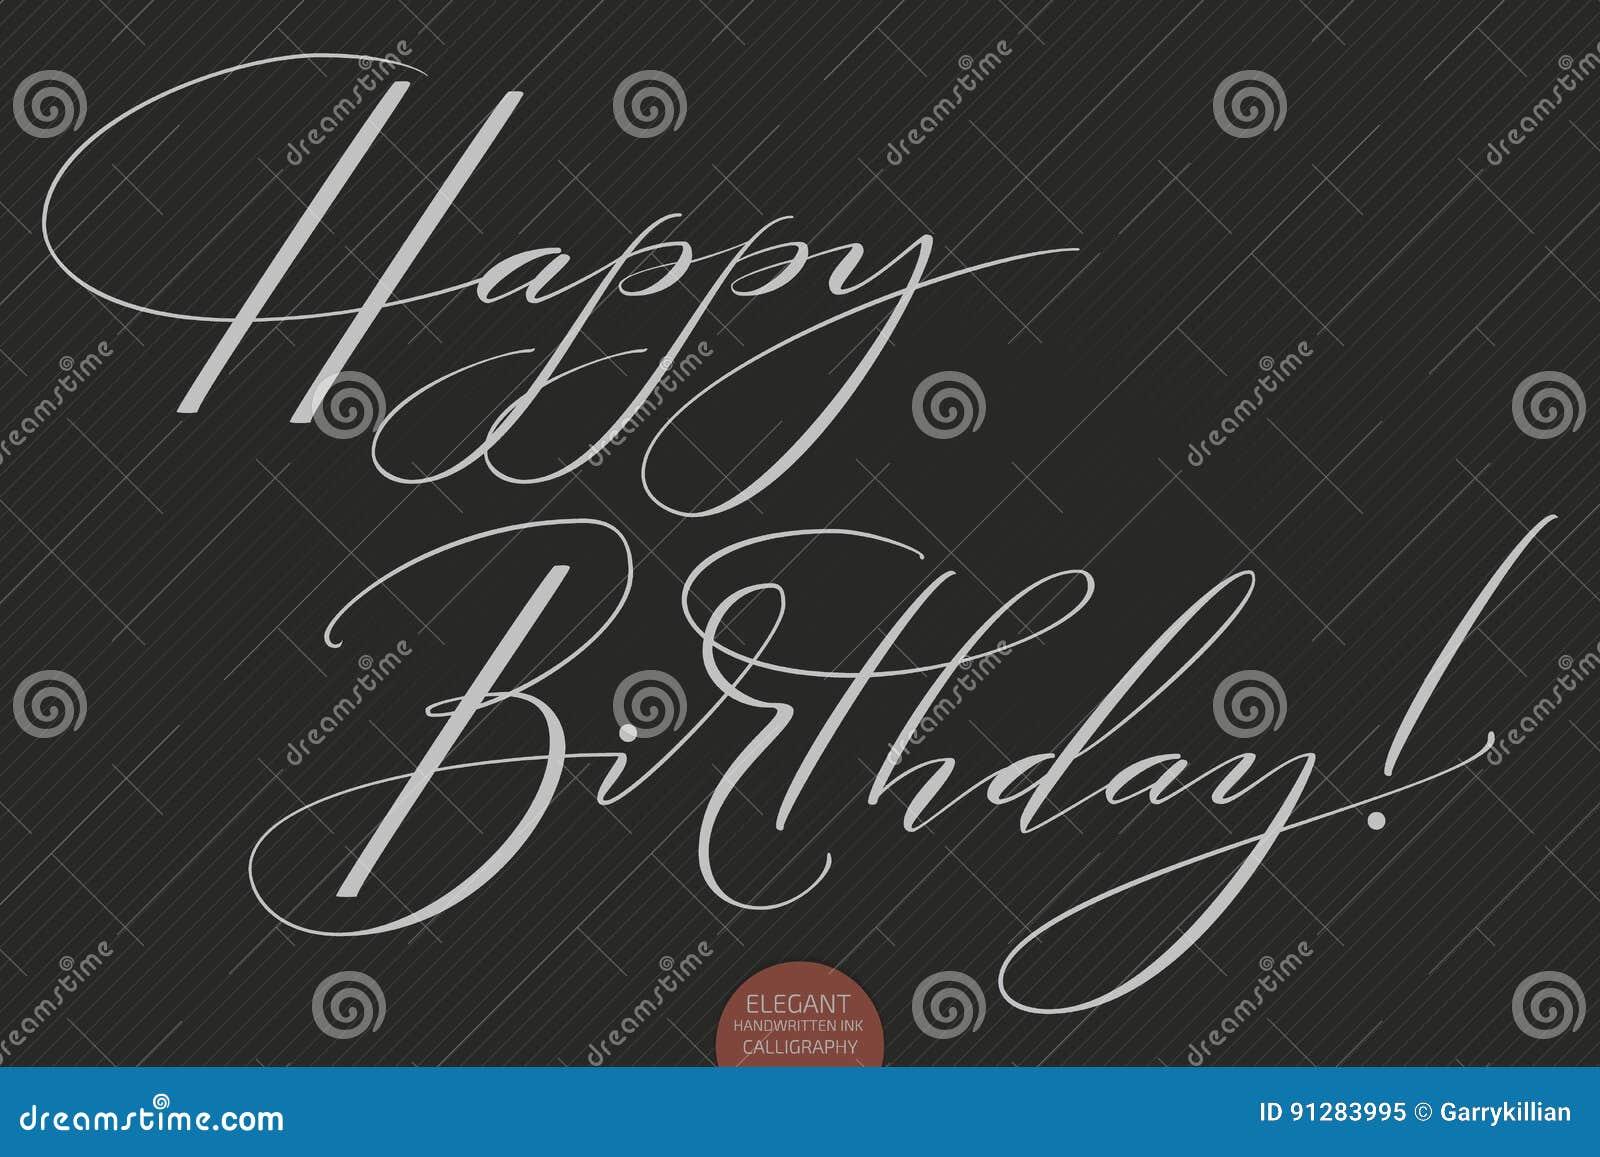 Hand Drawn Lettering Happy Birthday Elegant Modern Handwritten